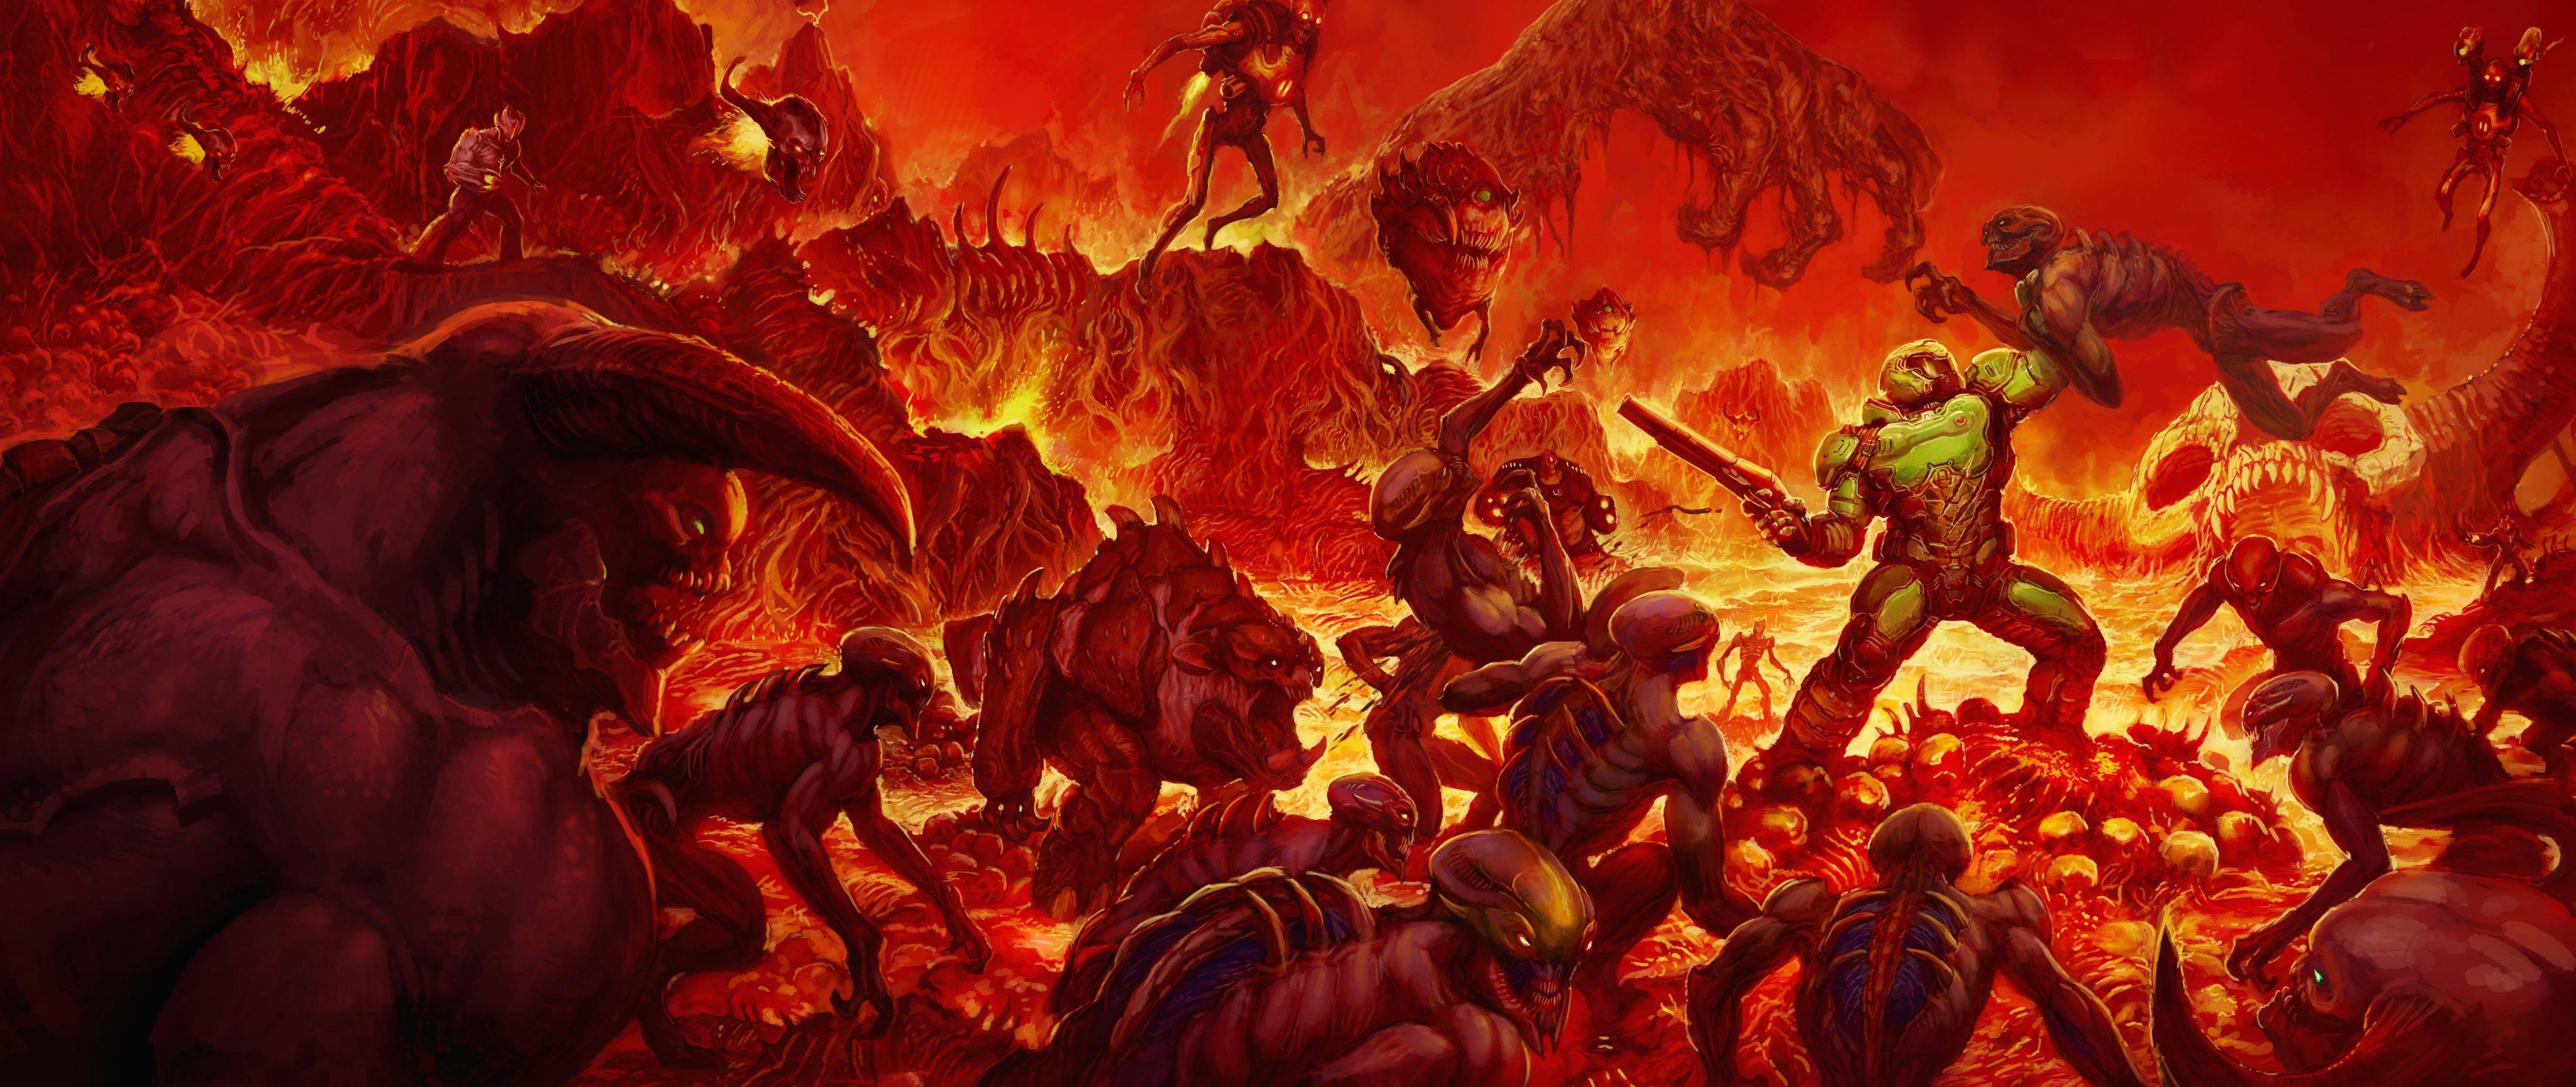 Doom wallpapers photos and desktop backgrounds up to 8k - 8k desktop backgrounds ...